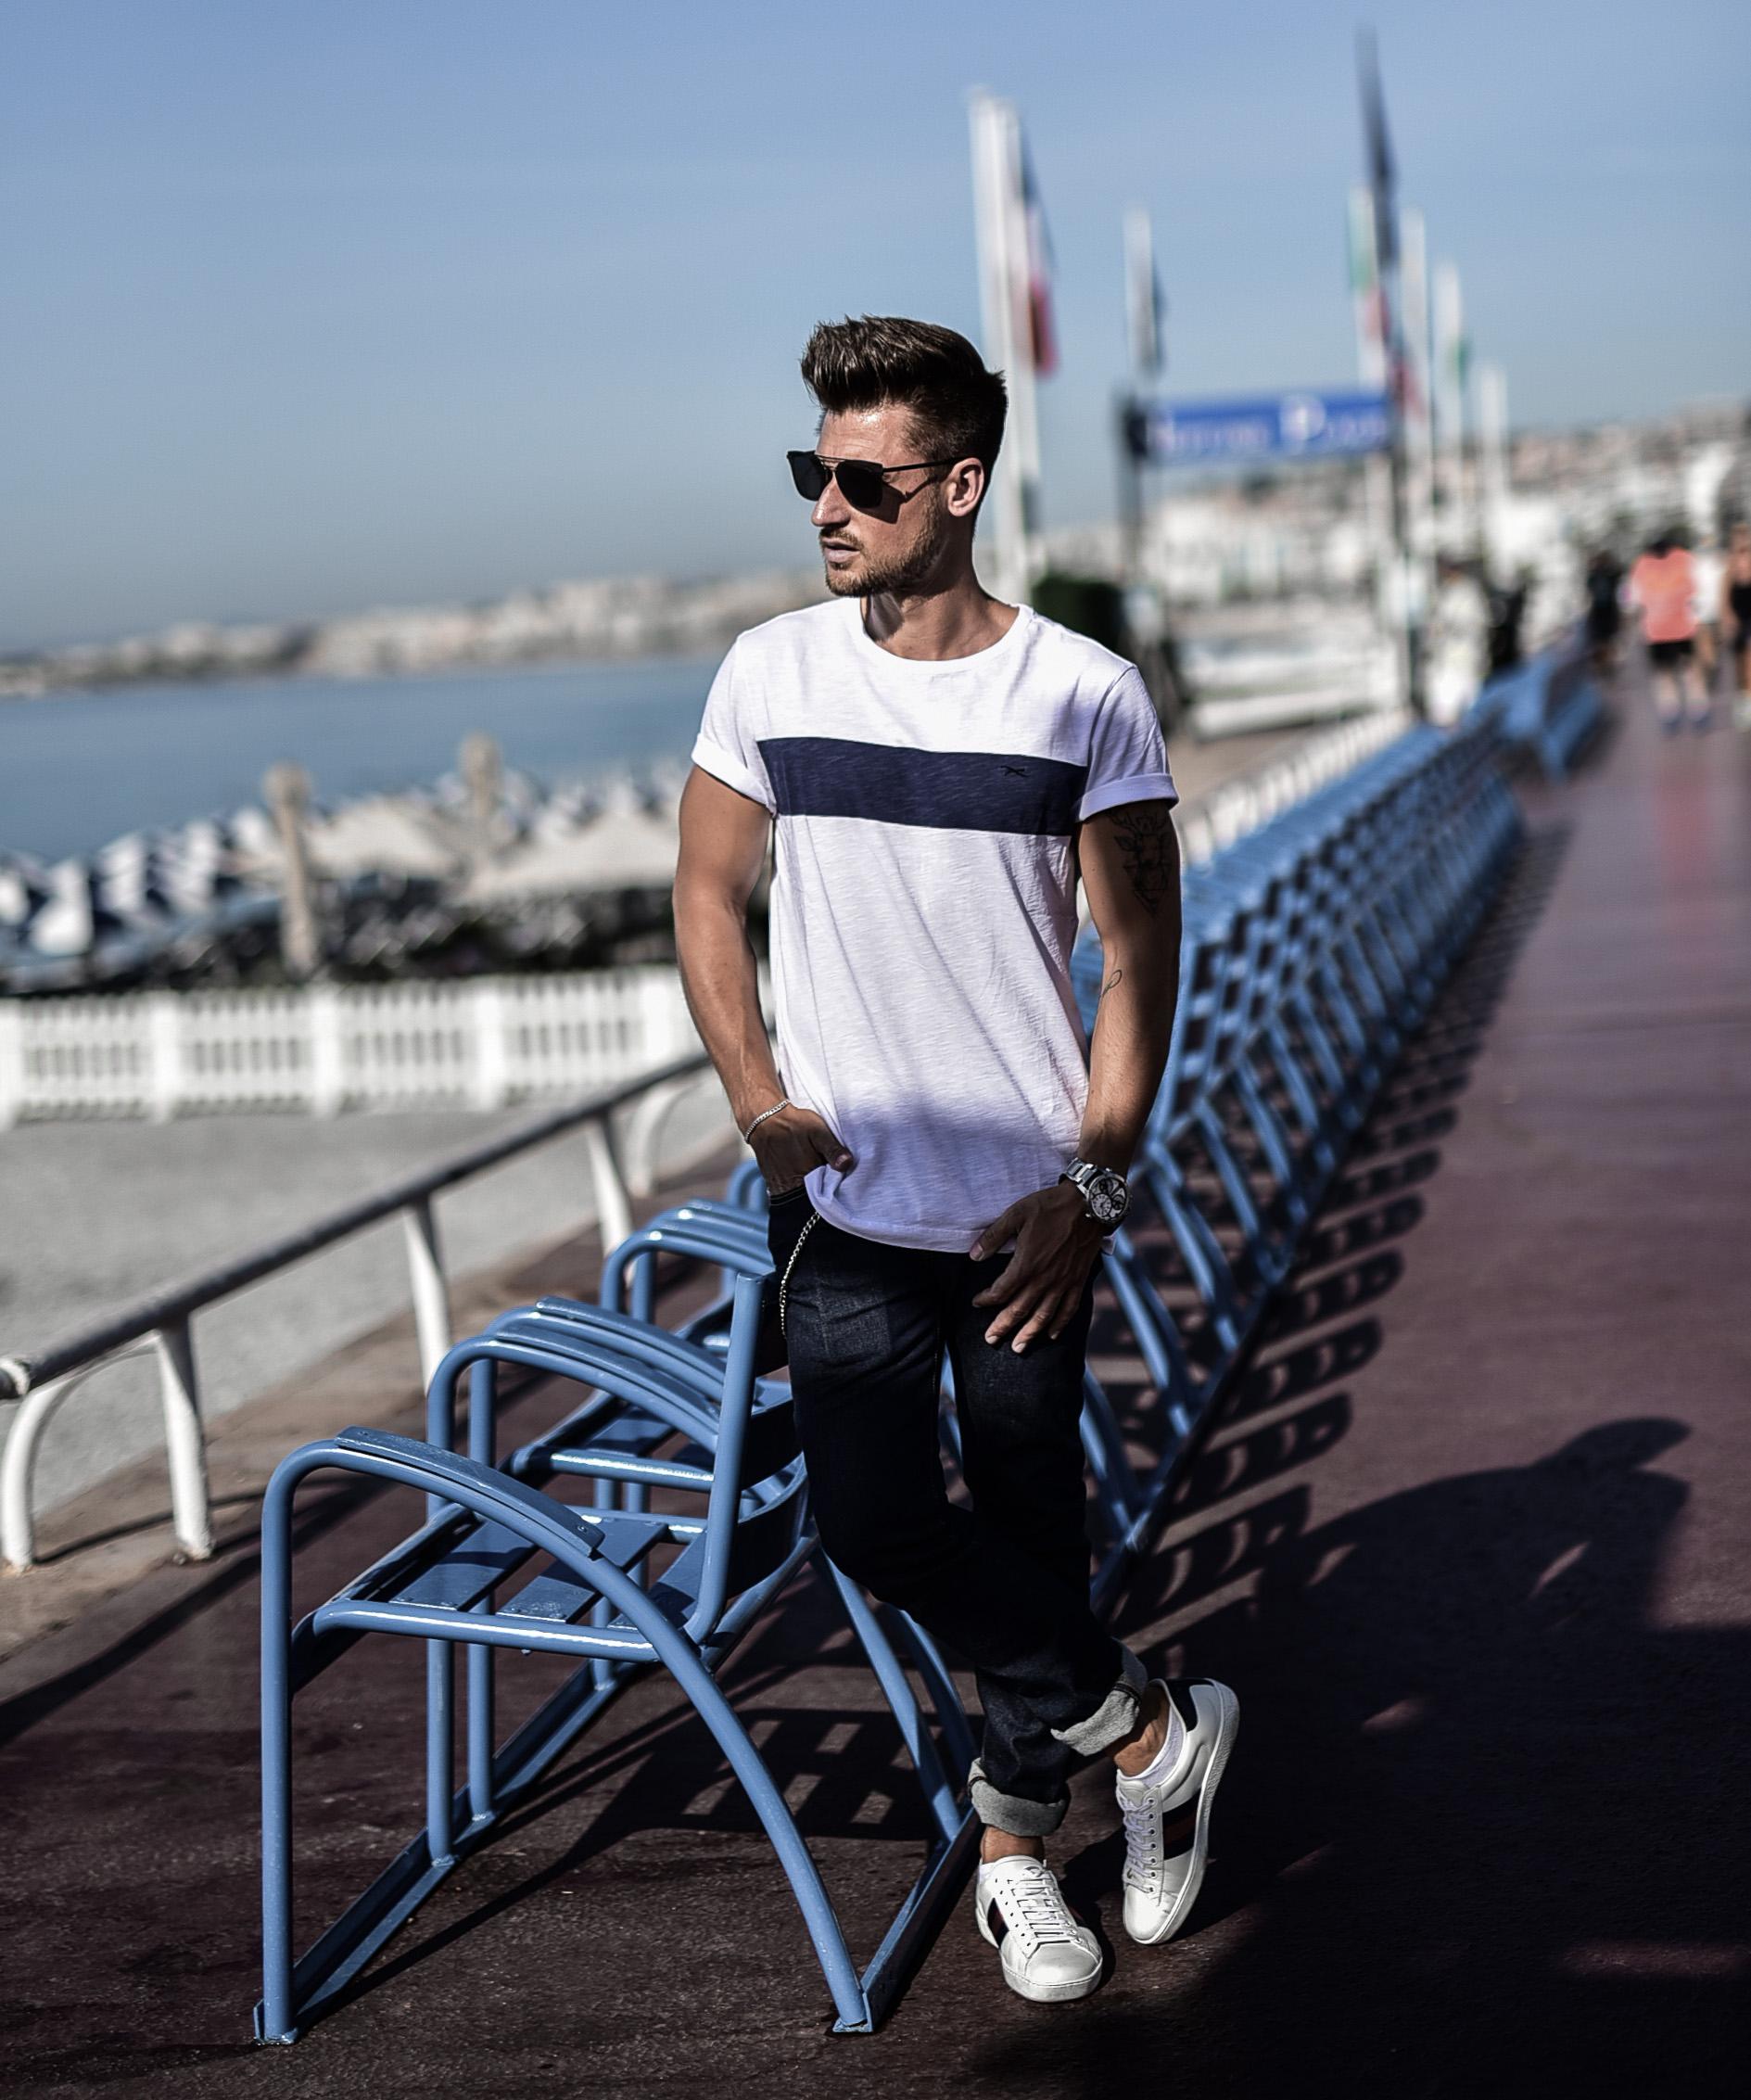 Tommeezjerry-Maennermodeblog-Maennermode-Fashionblog-Styleblog-Berlinblog--Lifestyleblog-Levis-Gucci-Sneaker-Police-Lifestyle-Denim-Look-Nizza-Frankreich-Cote-dazur-Brax-Fashion